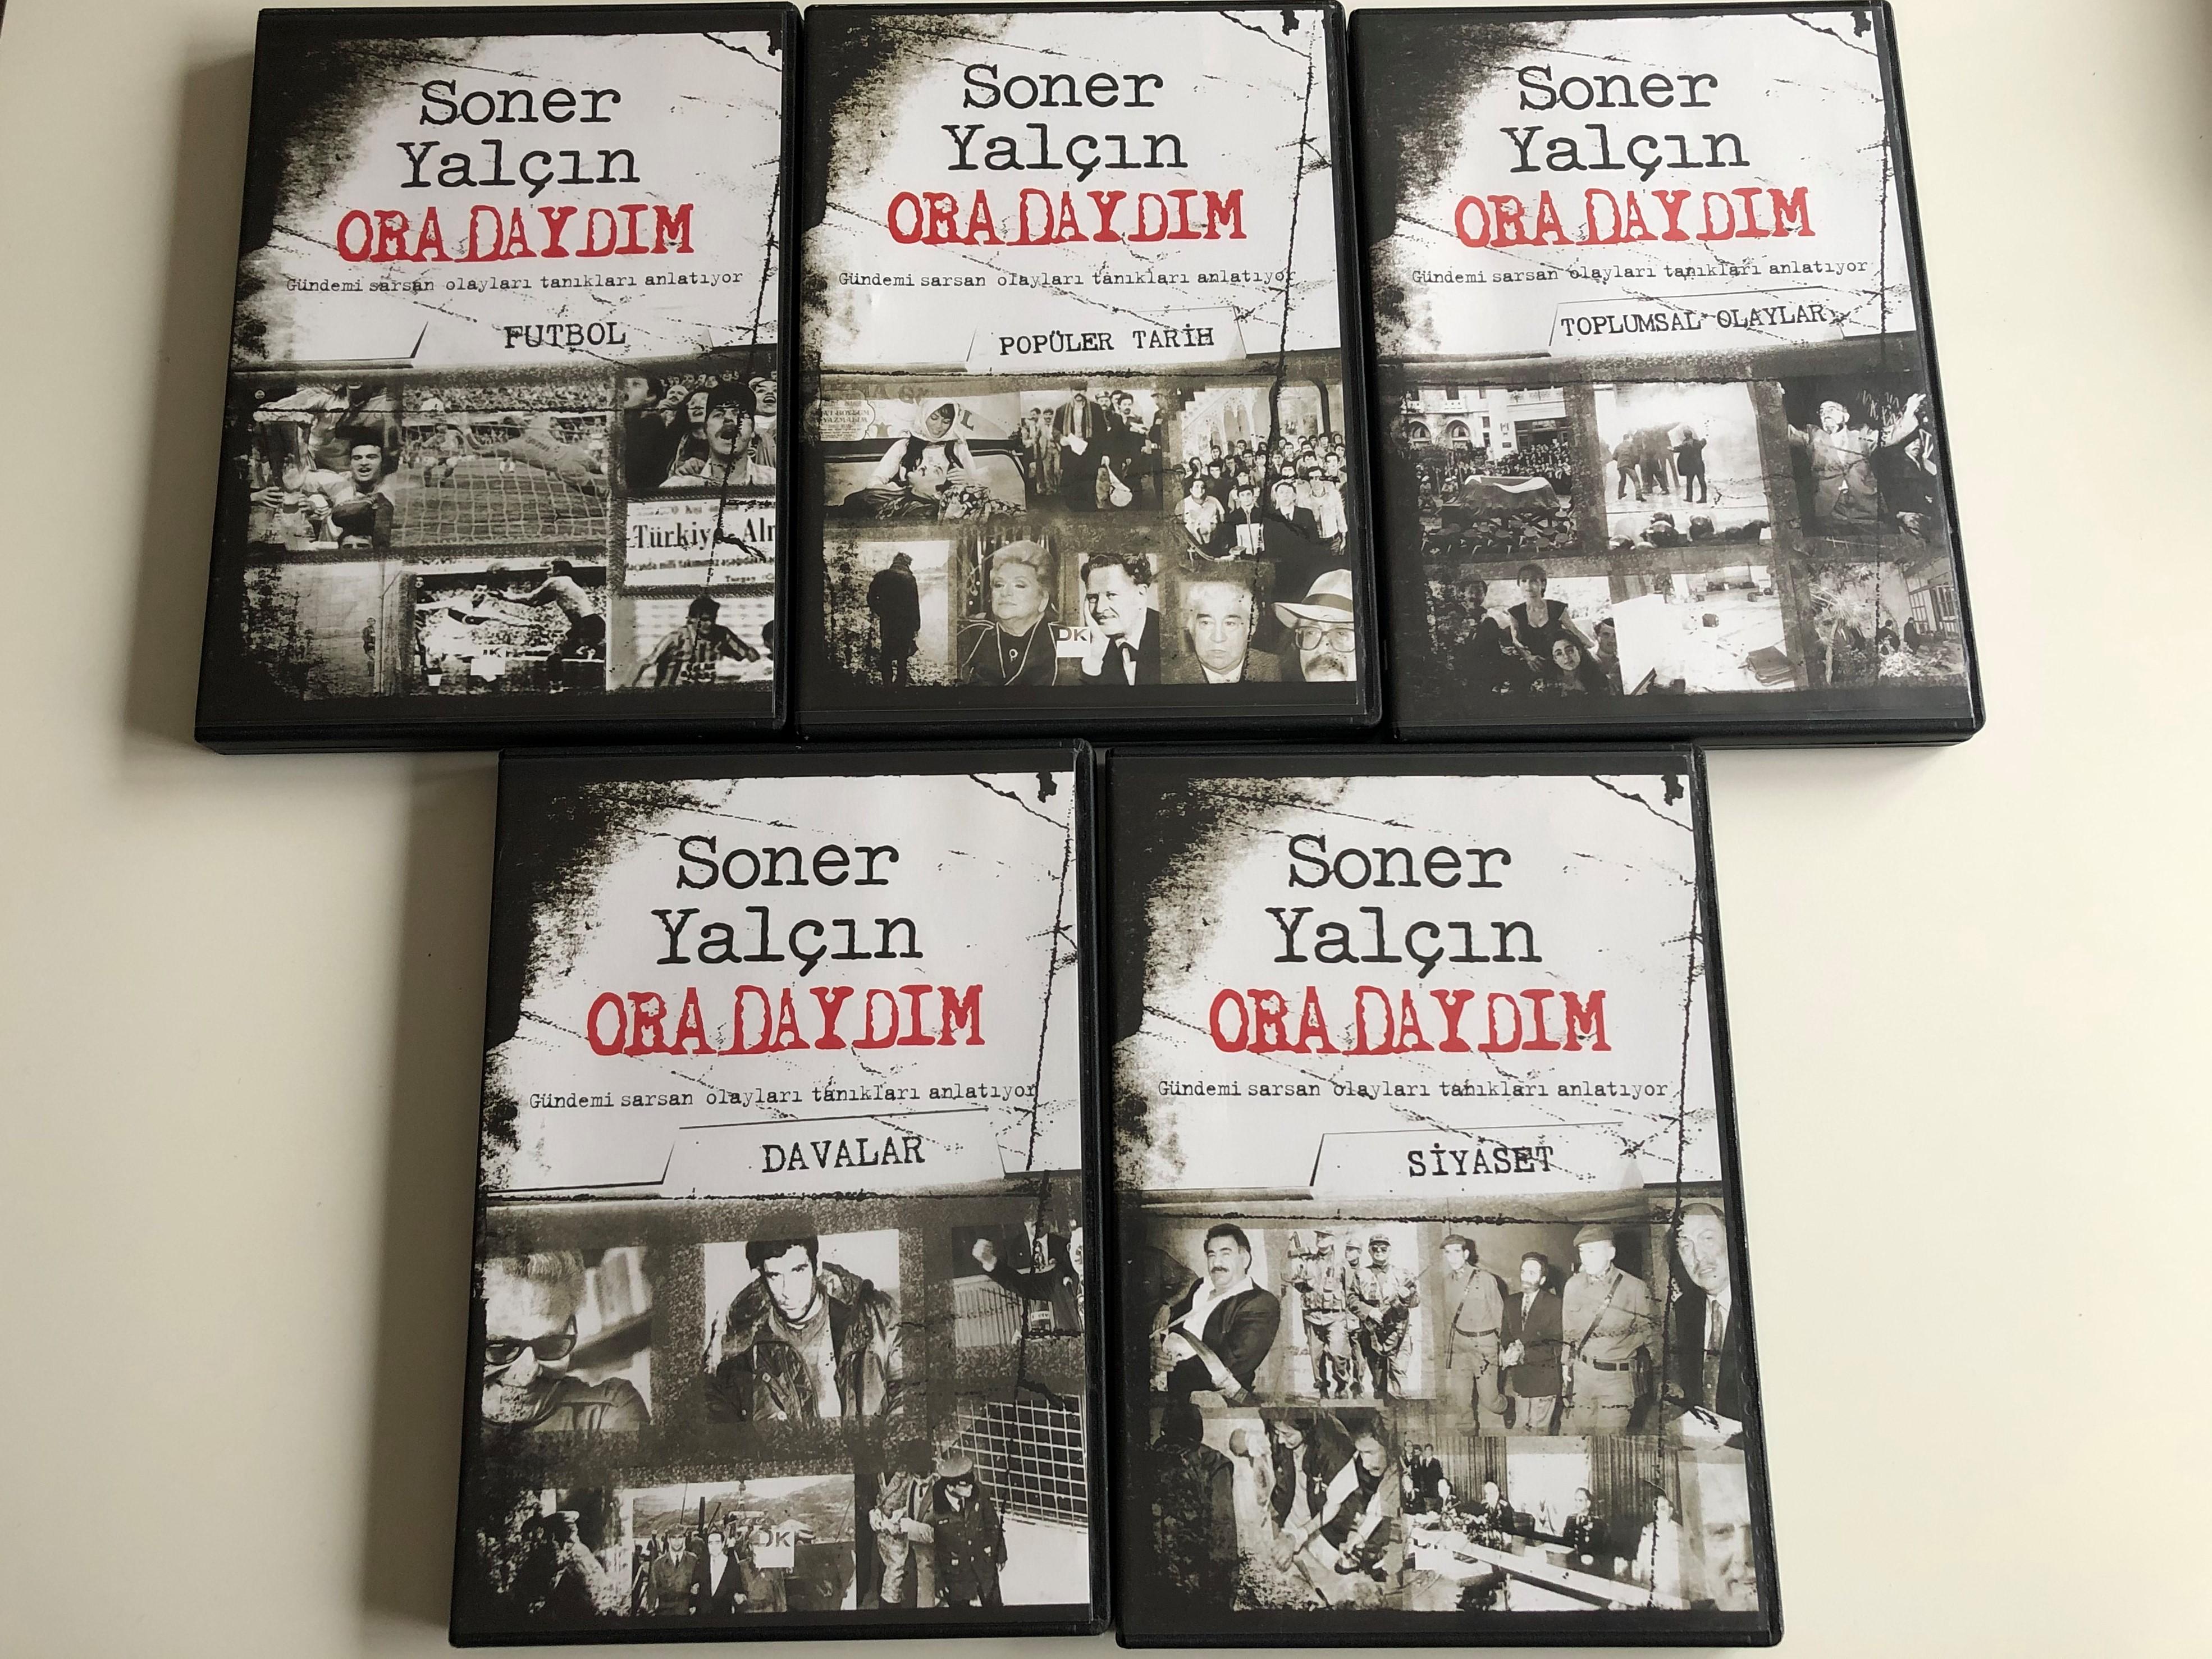 soner-yalcin-oradaydim-dvd-set-2007-5-discs-20-hours-of-content-35-episodes-4.jpg